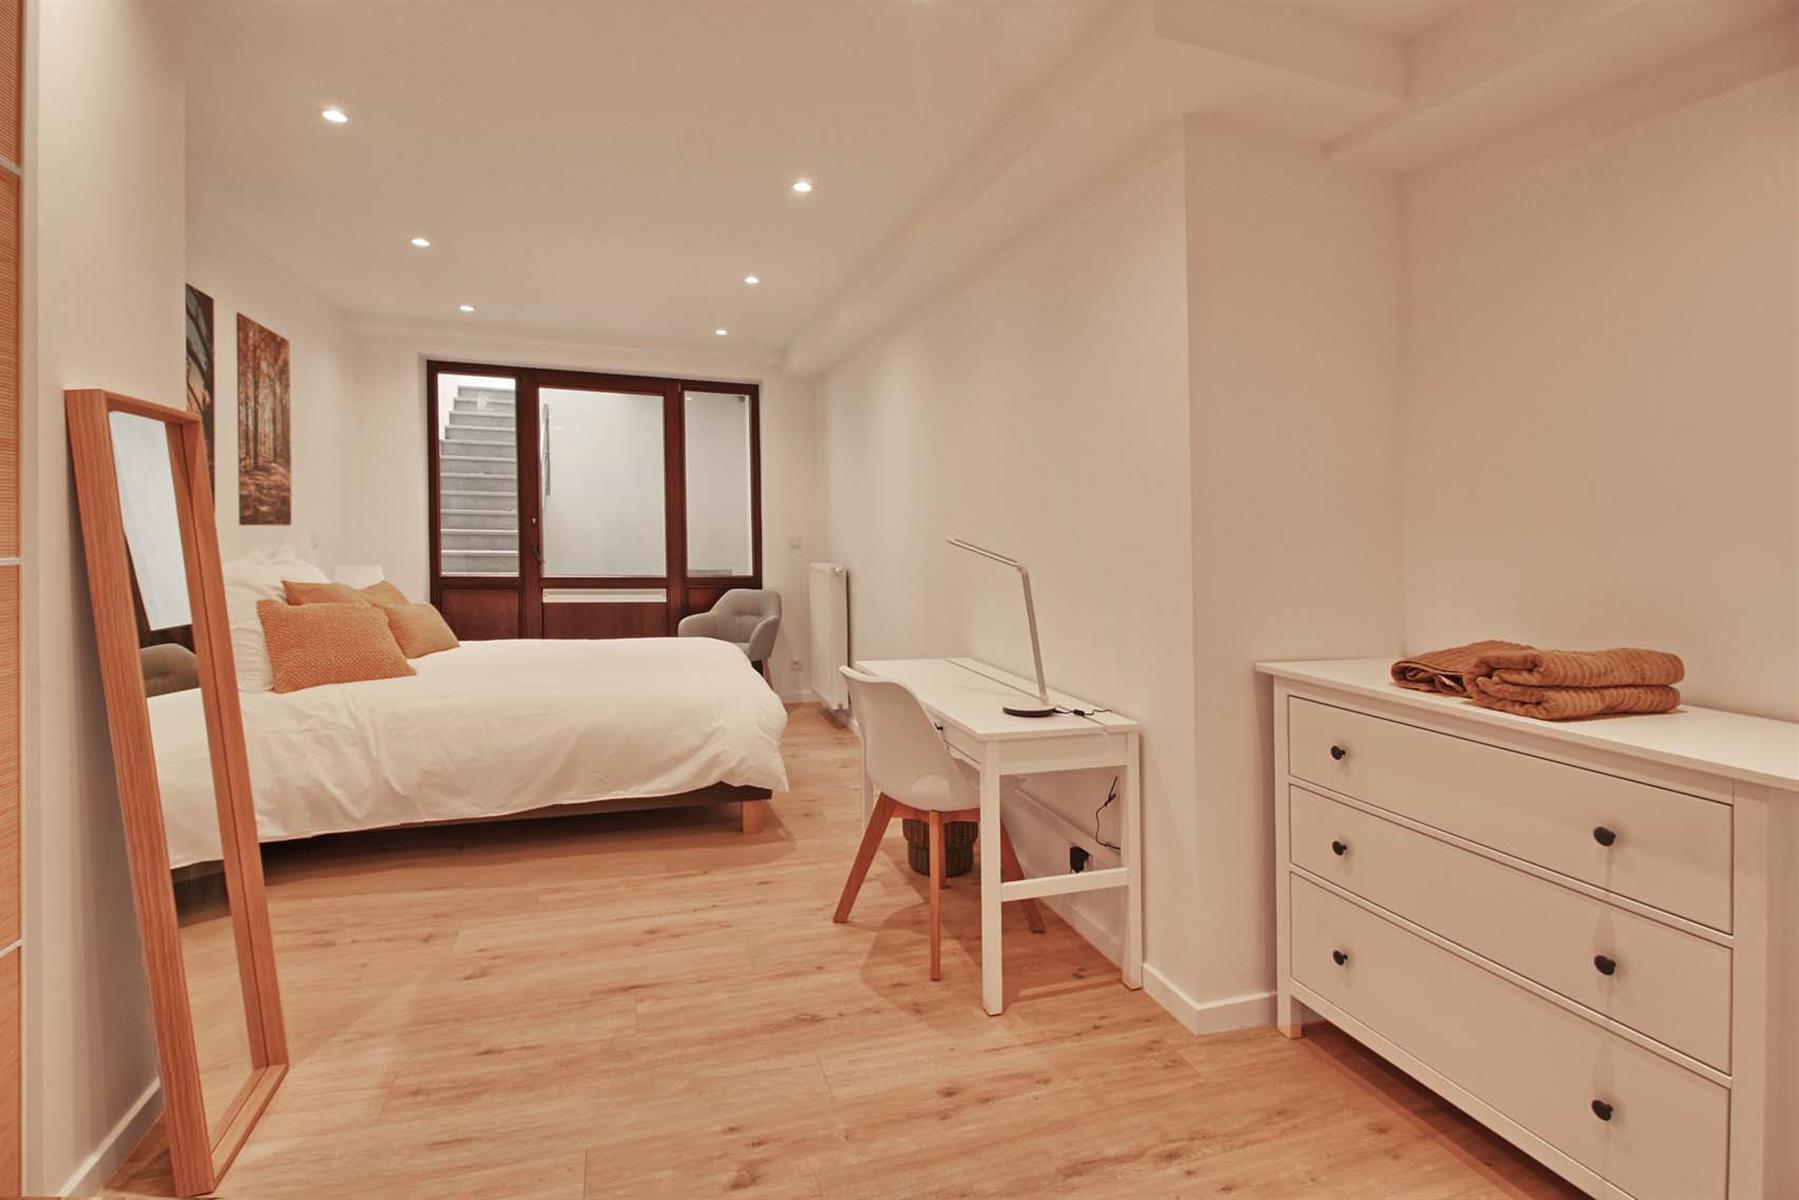 Maison - Ixelles - #4106764-8